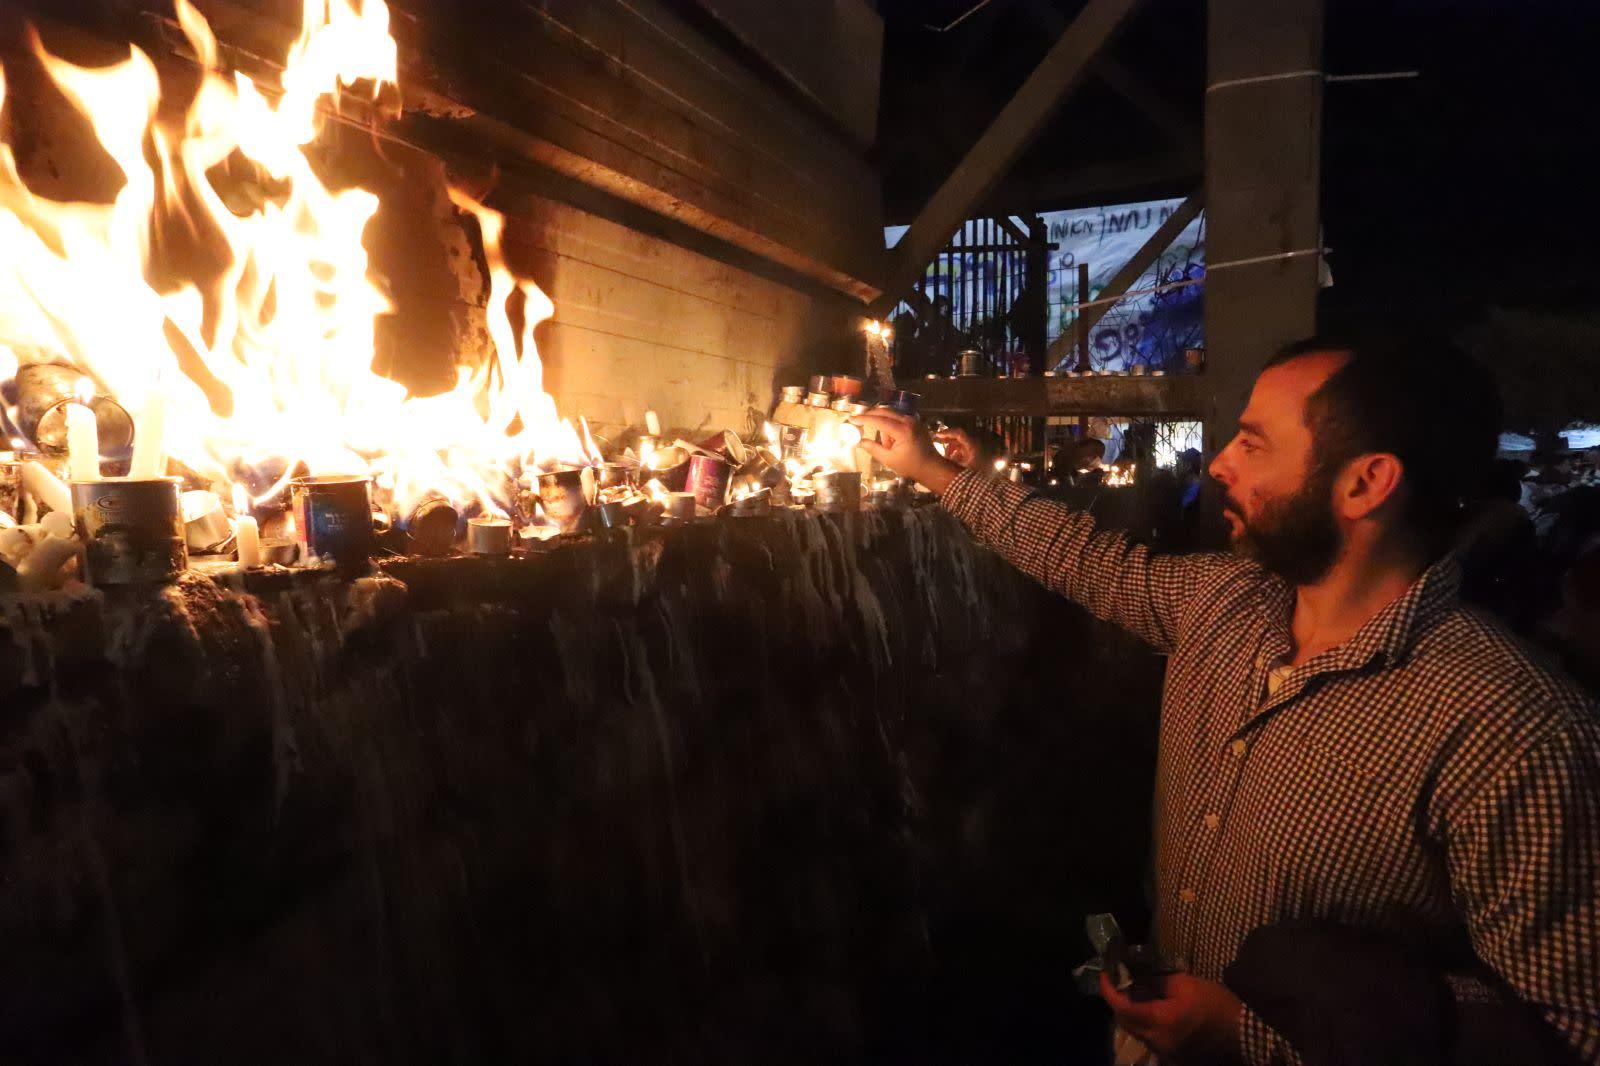 Worshippers celebrate Lag BaOmer in the northern Israeli city of Meron (EITAN ELHADAZ/TPS)